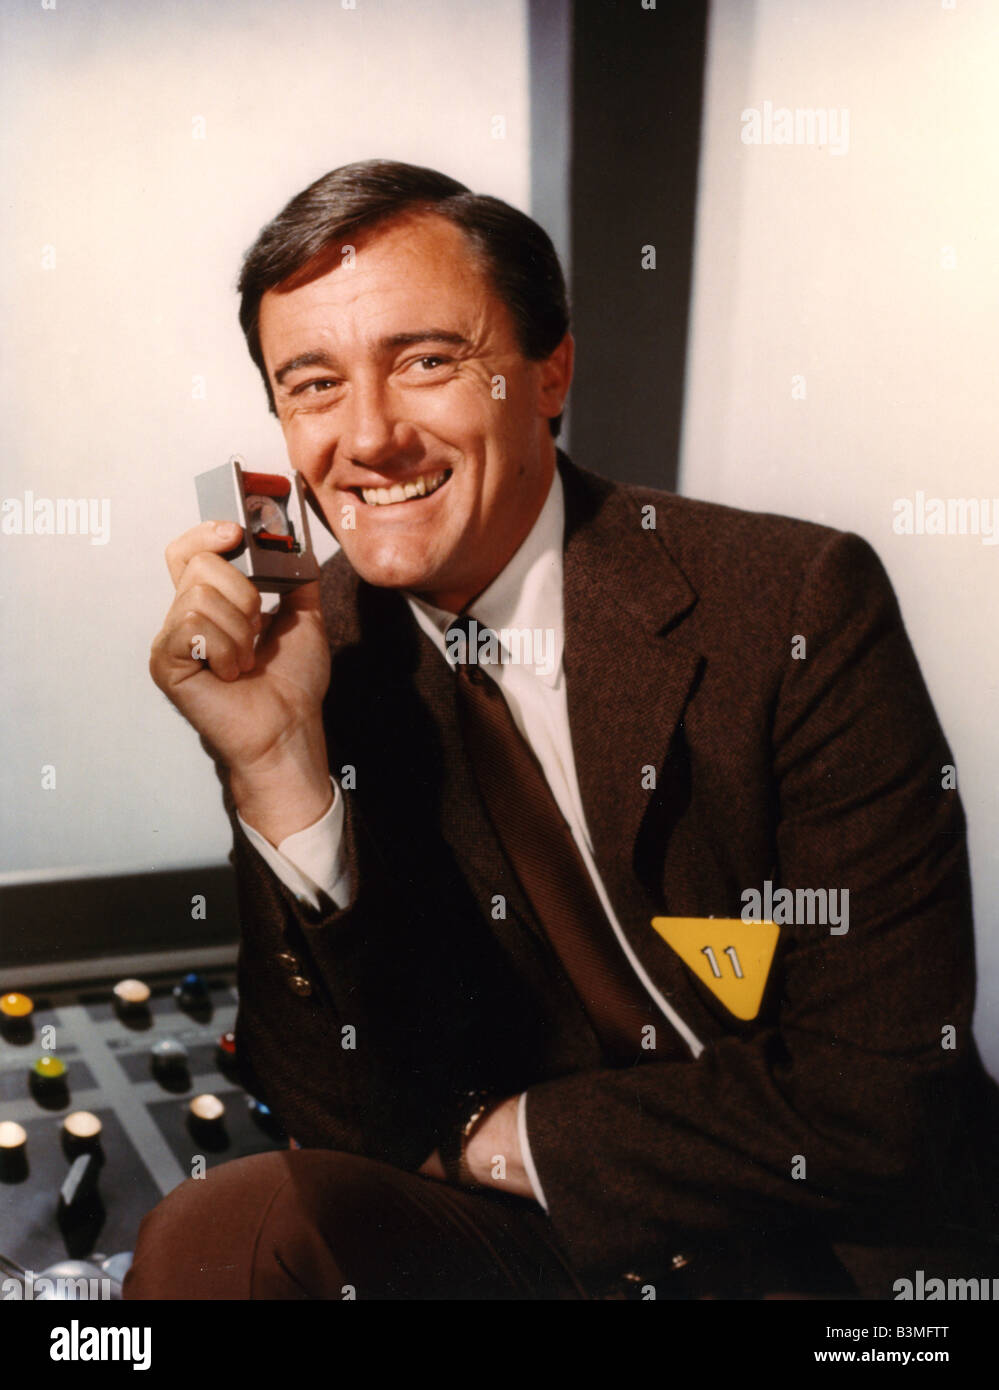 THE MAN FROM U.N.C.L.E.   US NBC Sixties TV series with Robert Vaughn - Stock Image